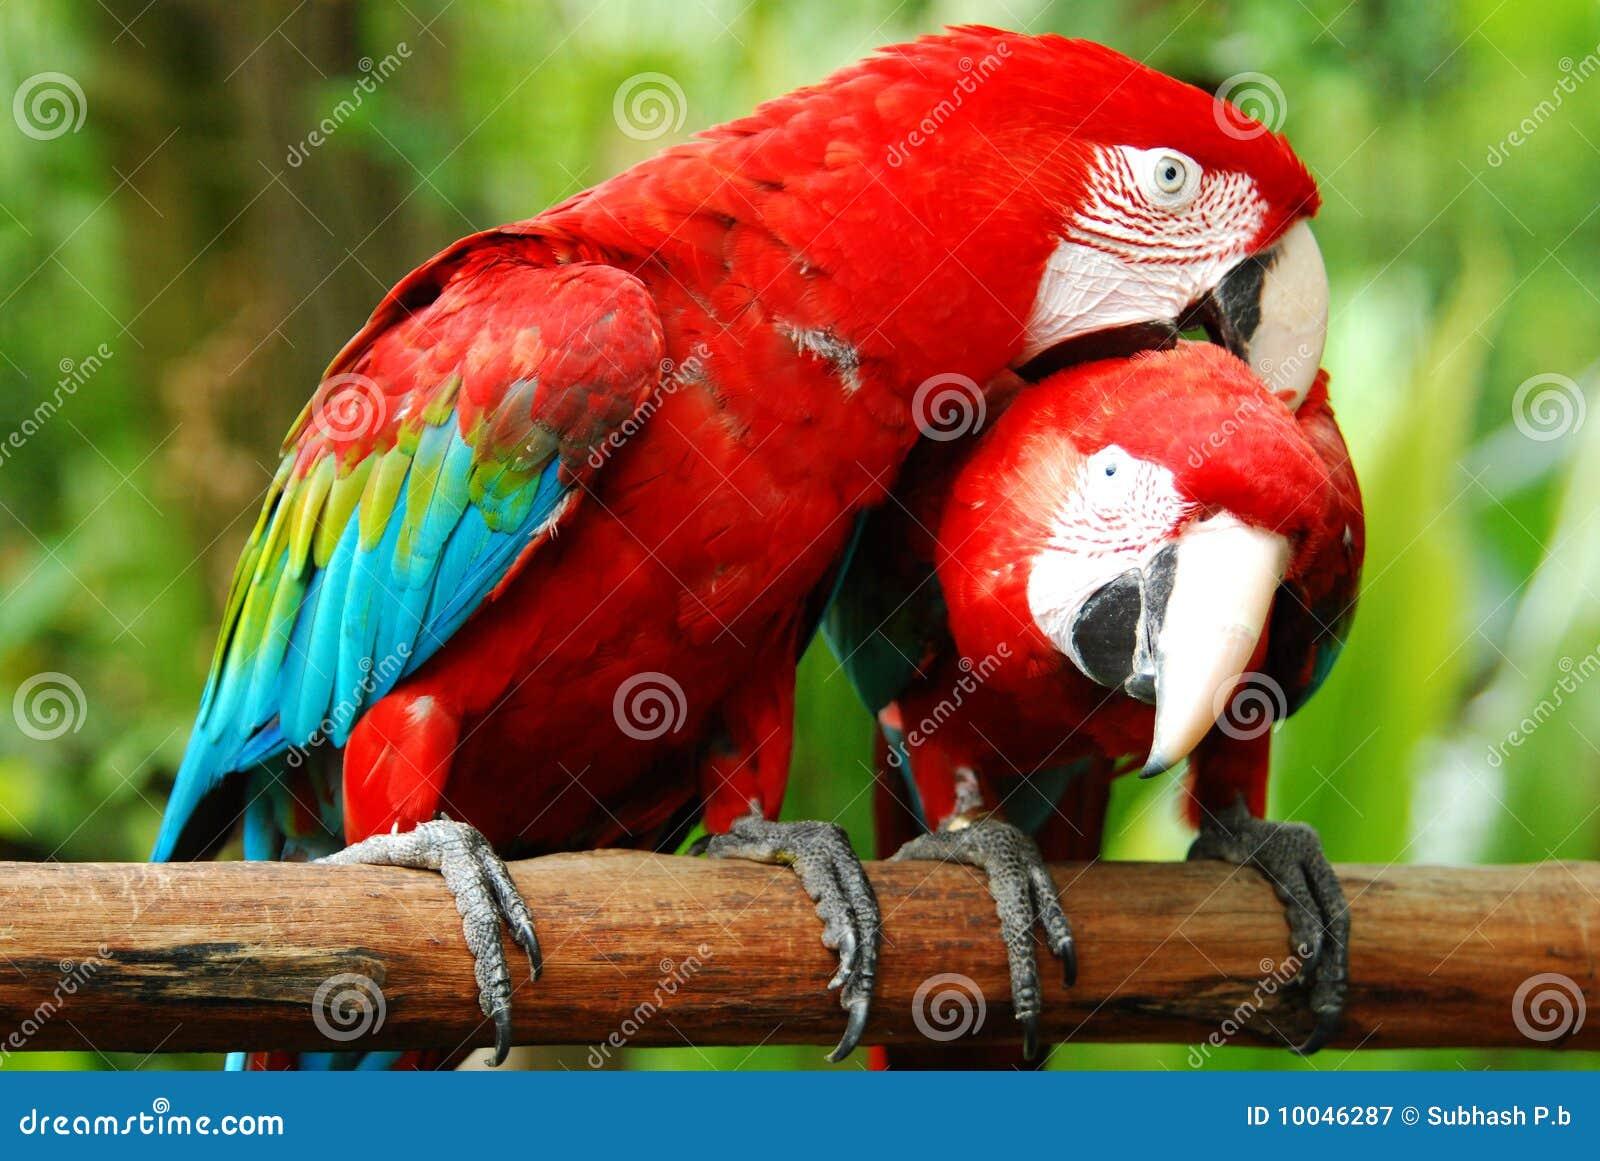 Uccelli del macaw di amore